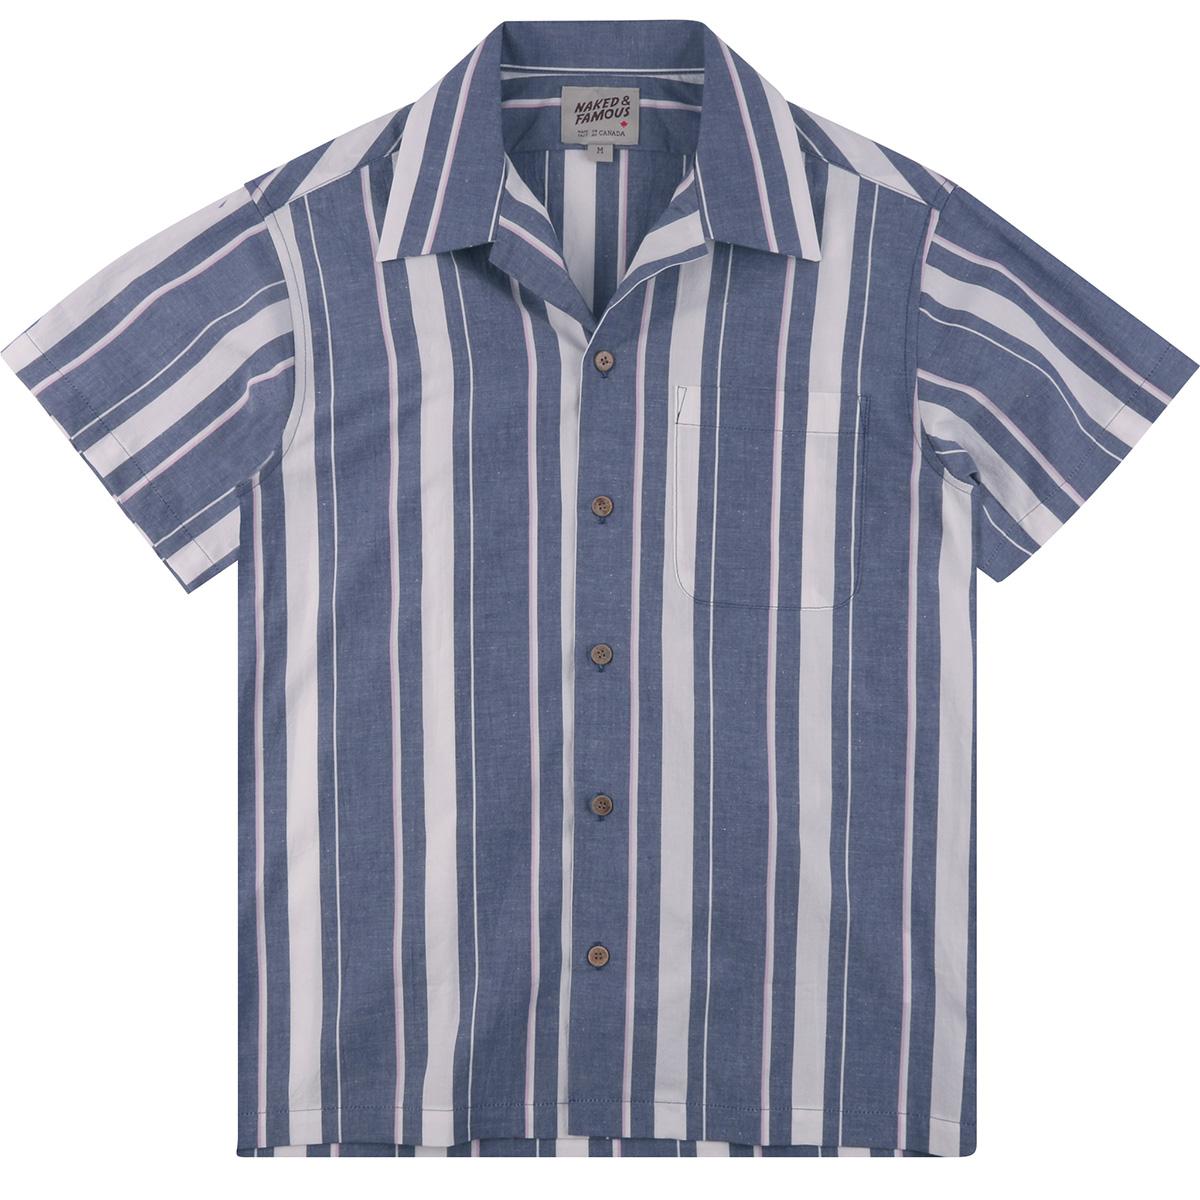 CHAMBRAY SLUB STRIPE - INDIGO - Aloha Shirt